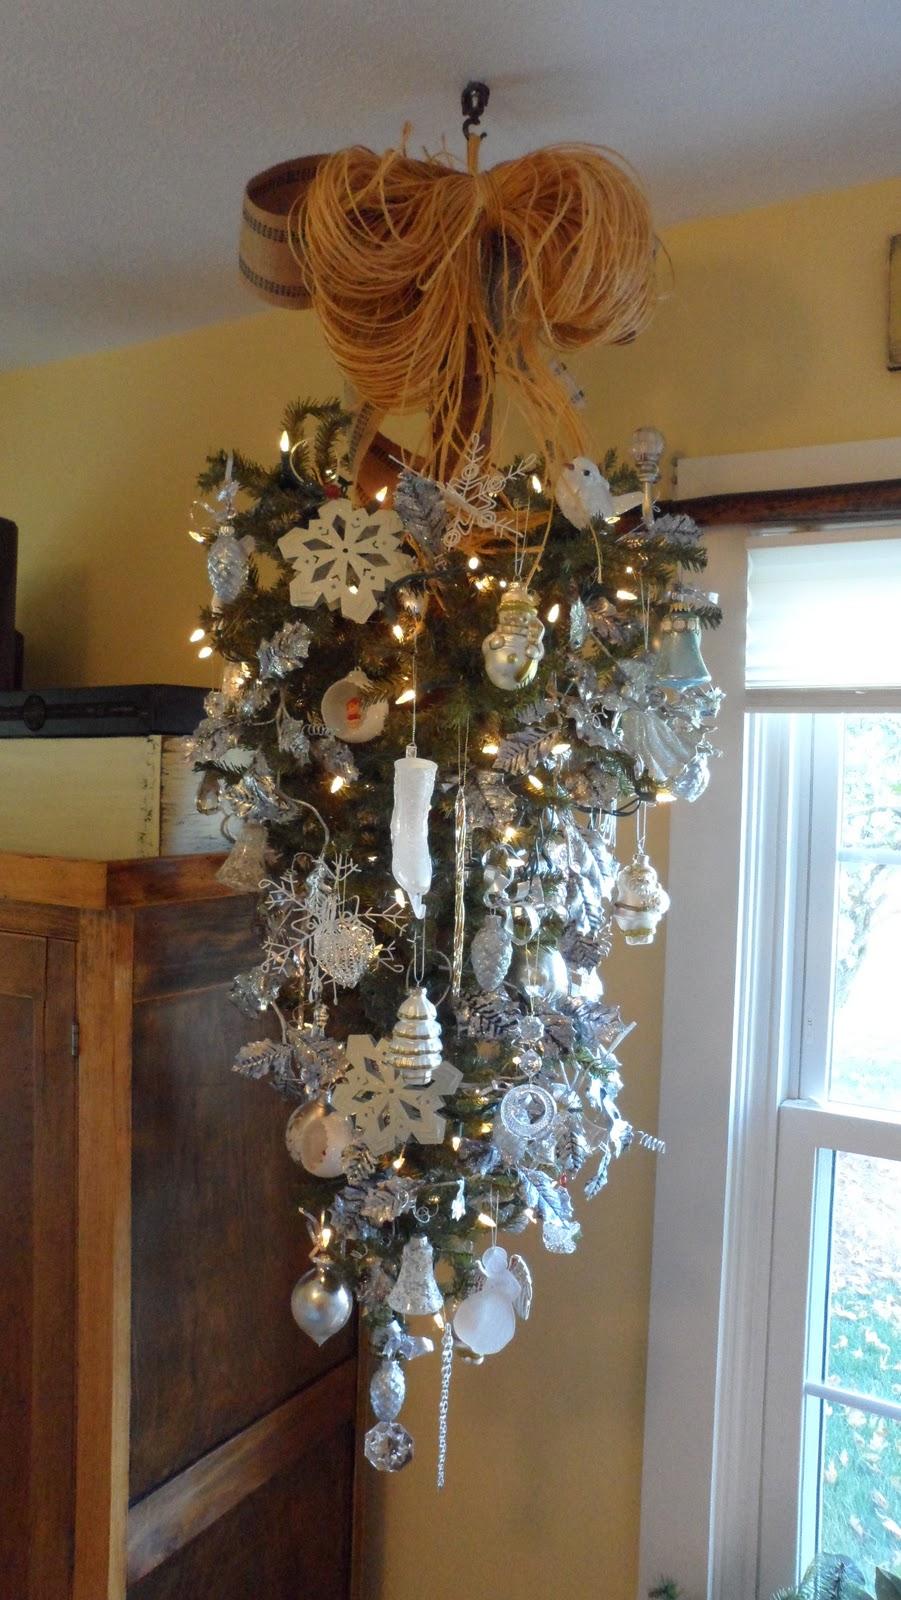 How To Hang A Christmas Tree Upside Down